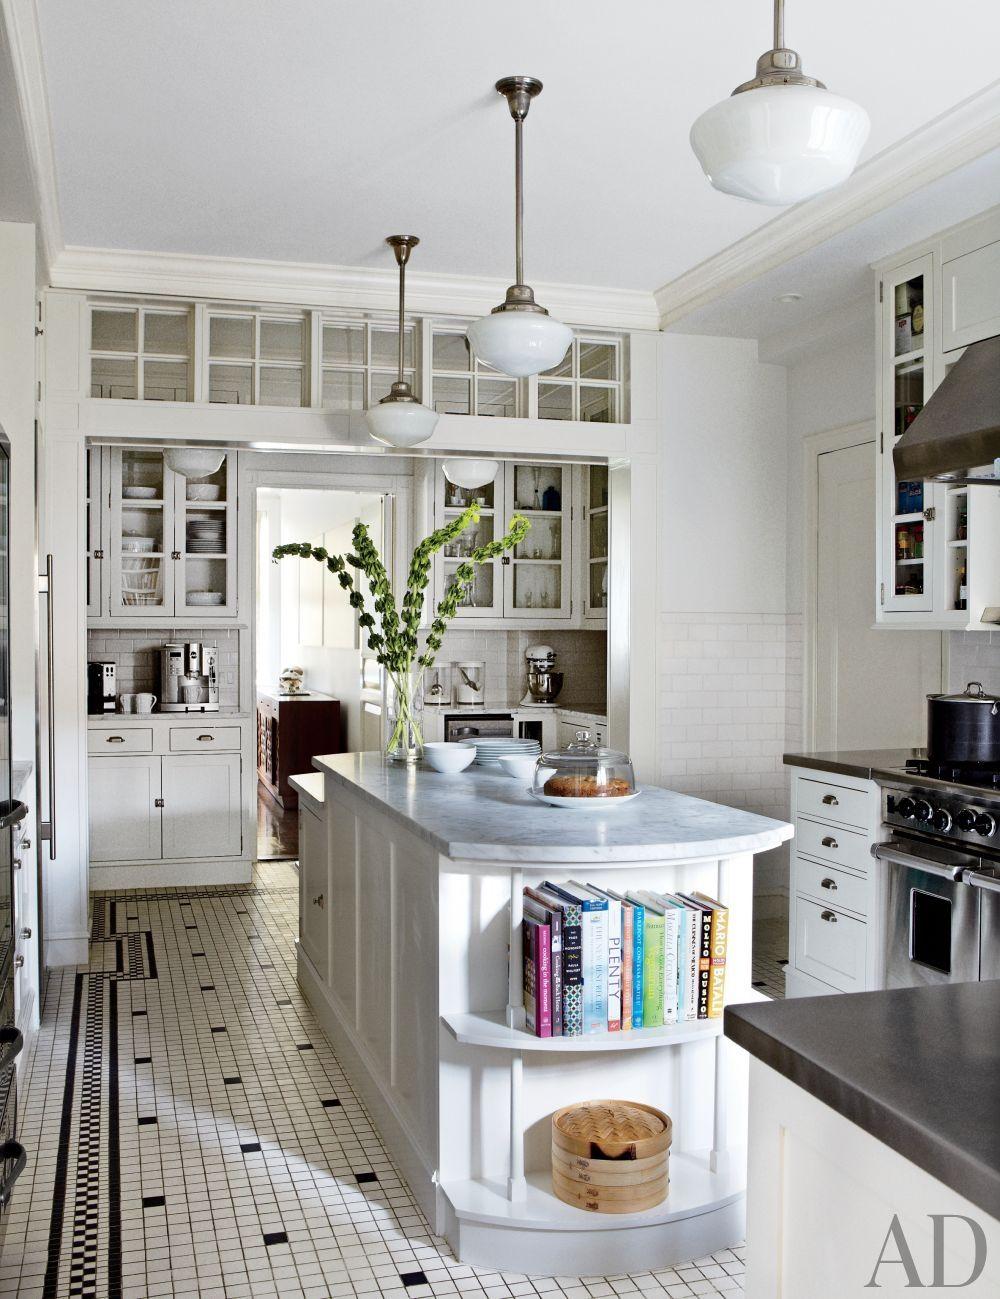 Traditional kitchen by gomez associates inc in new york new york